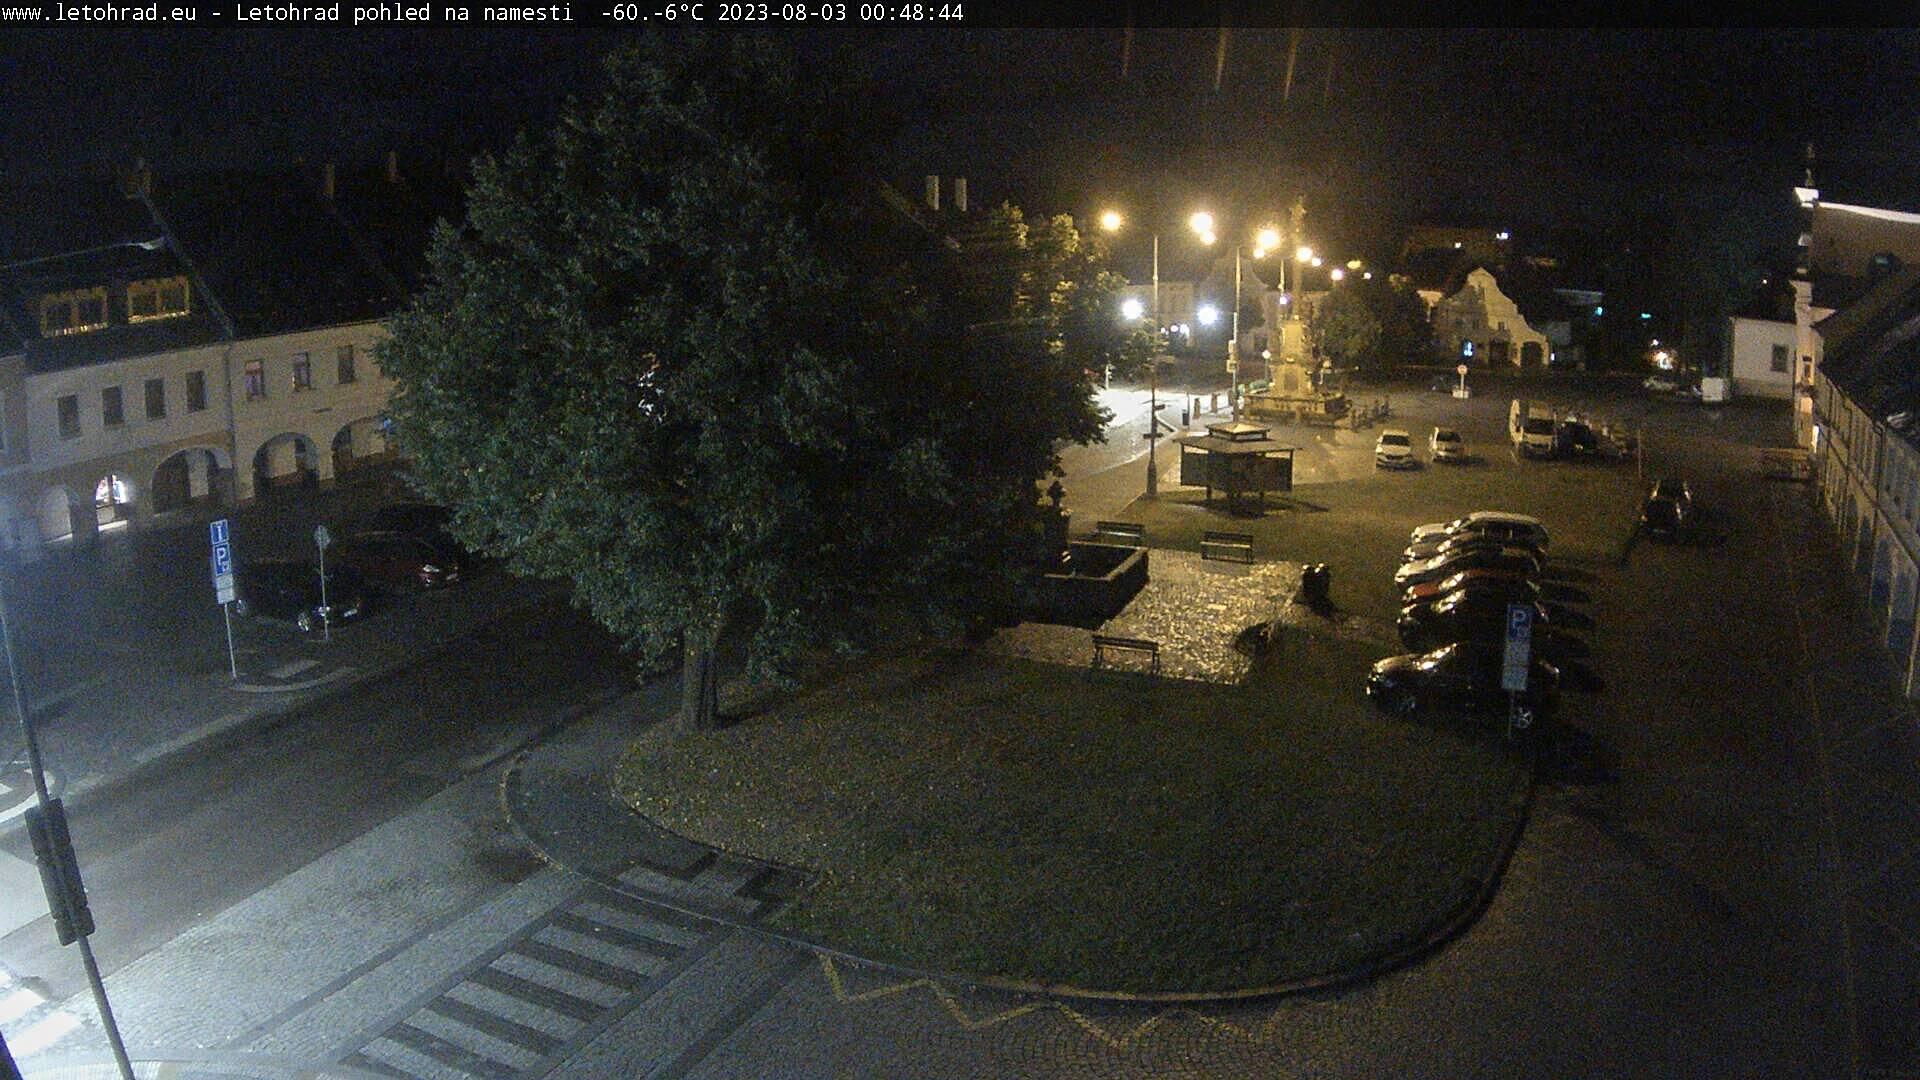 Webkamera - Letohrad